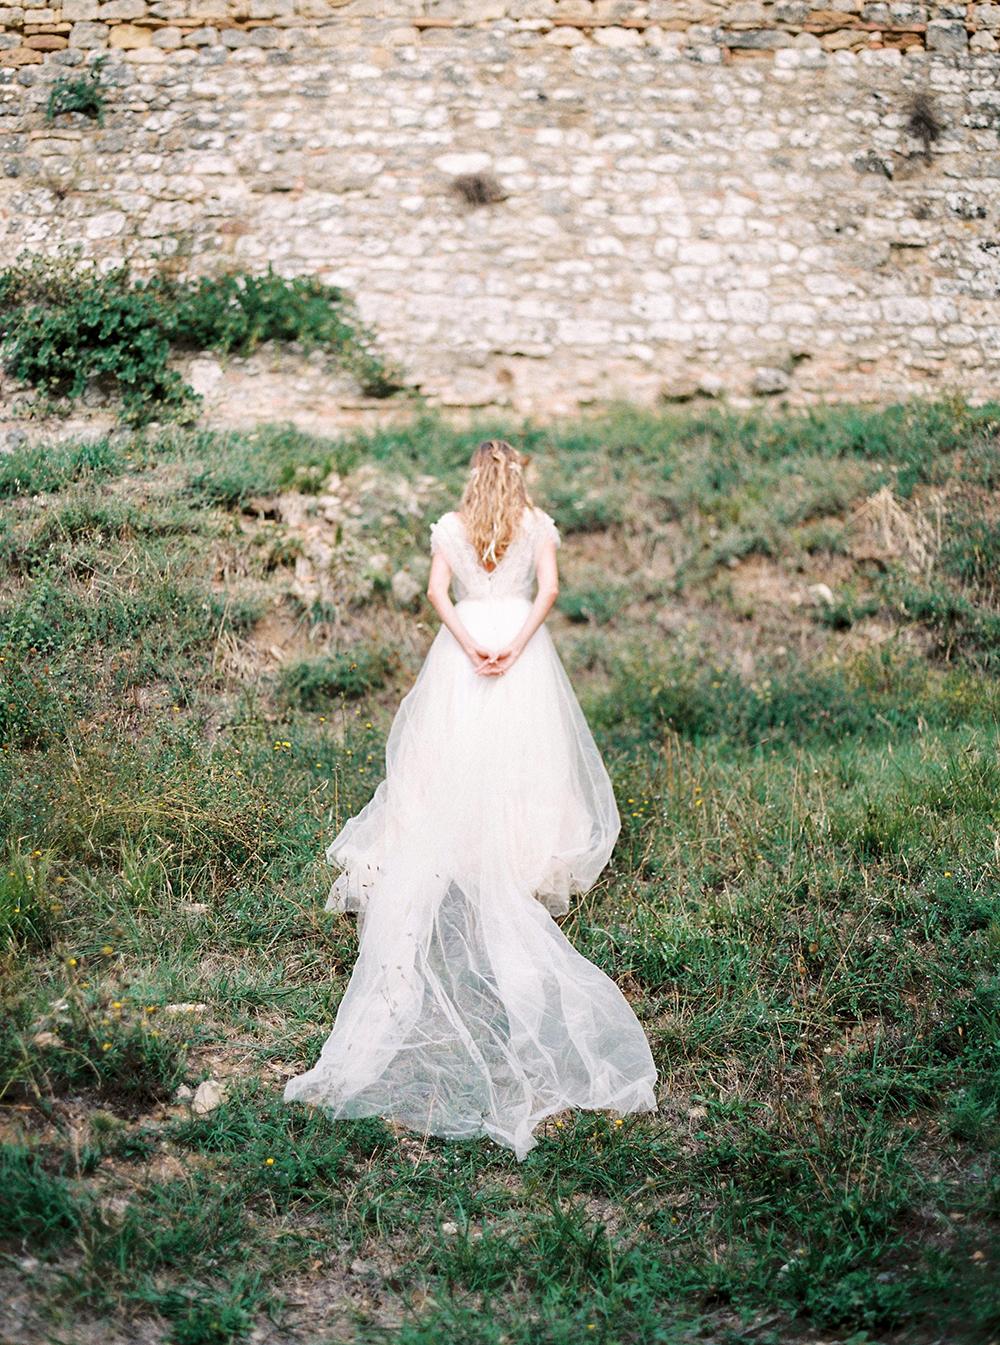 Olga_Plakitina_Photography_024.jpg